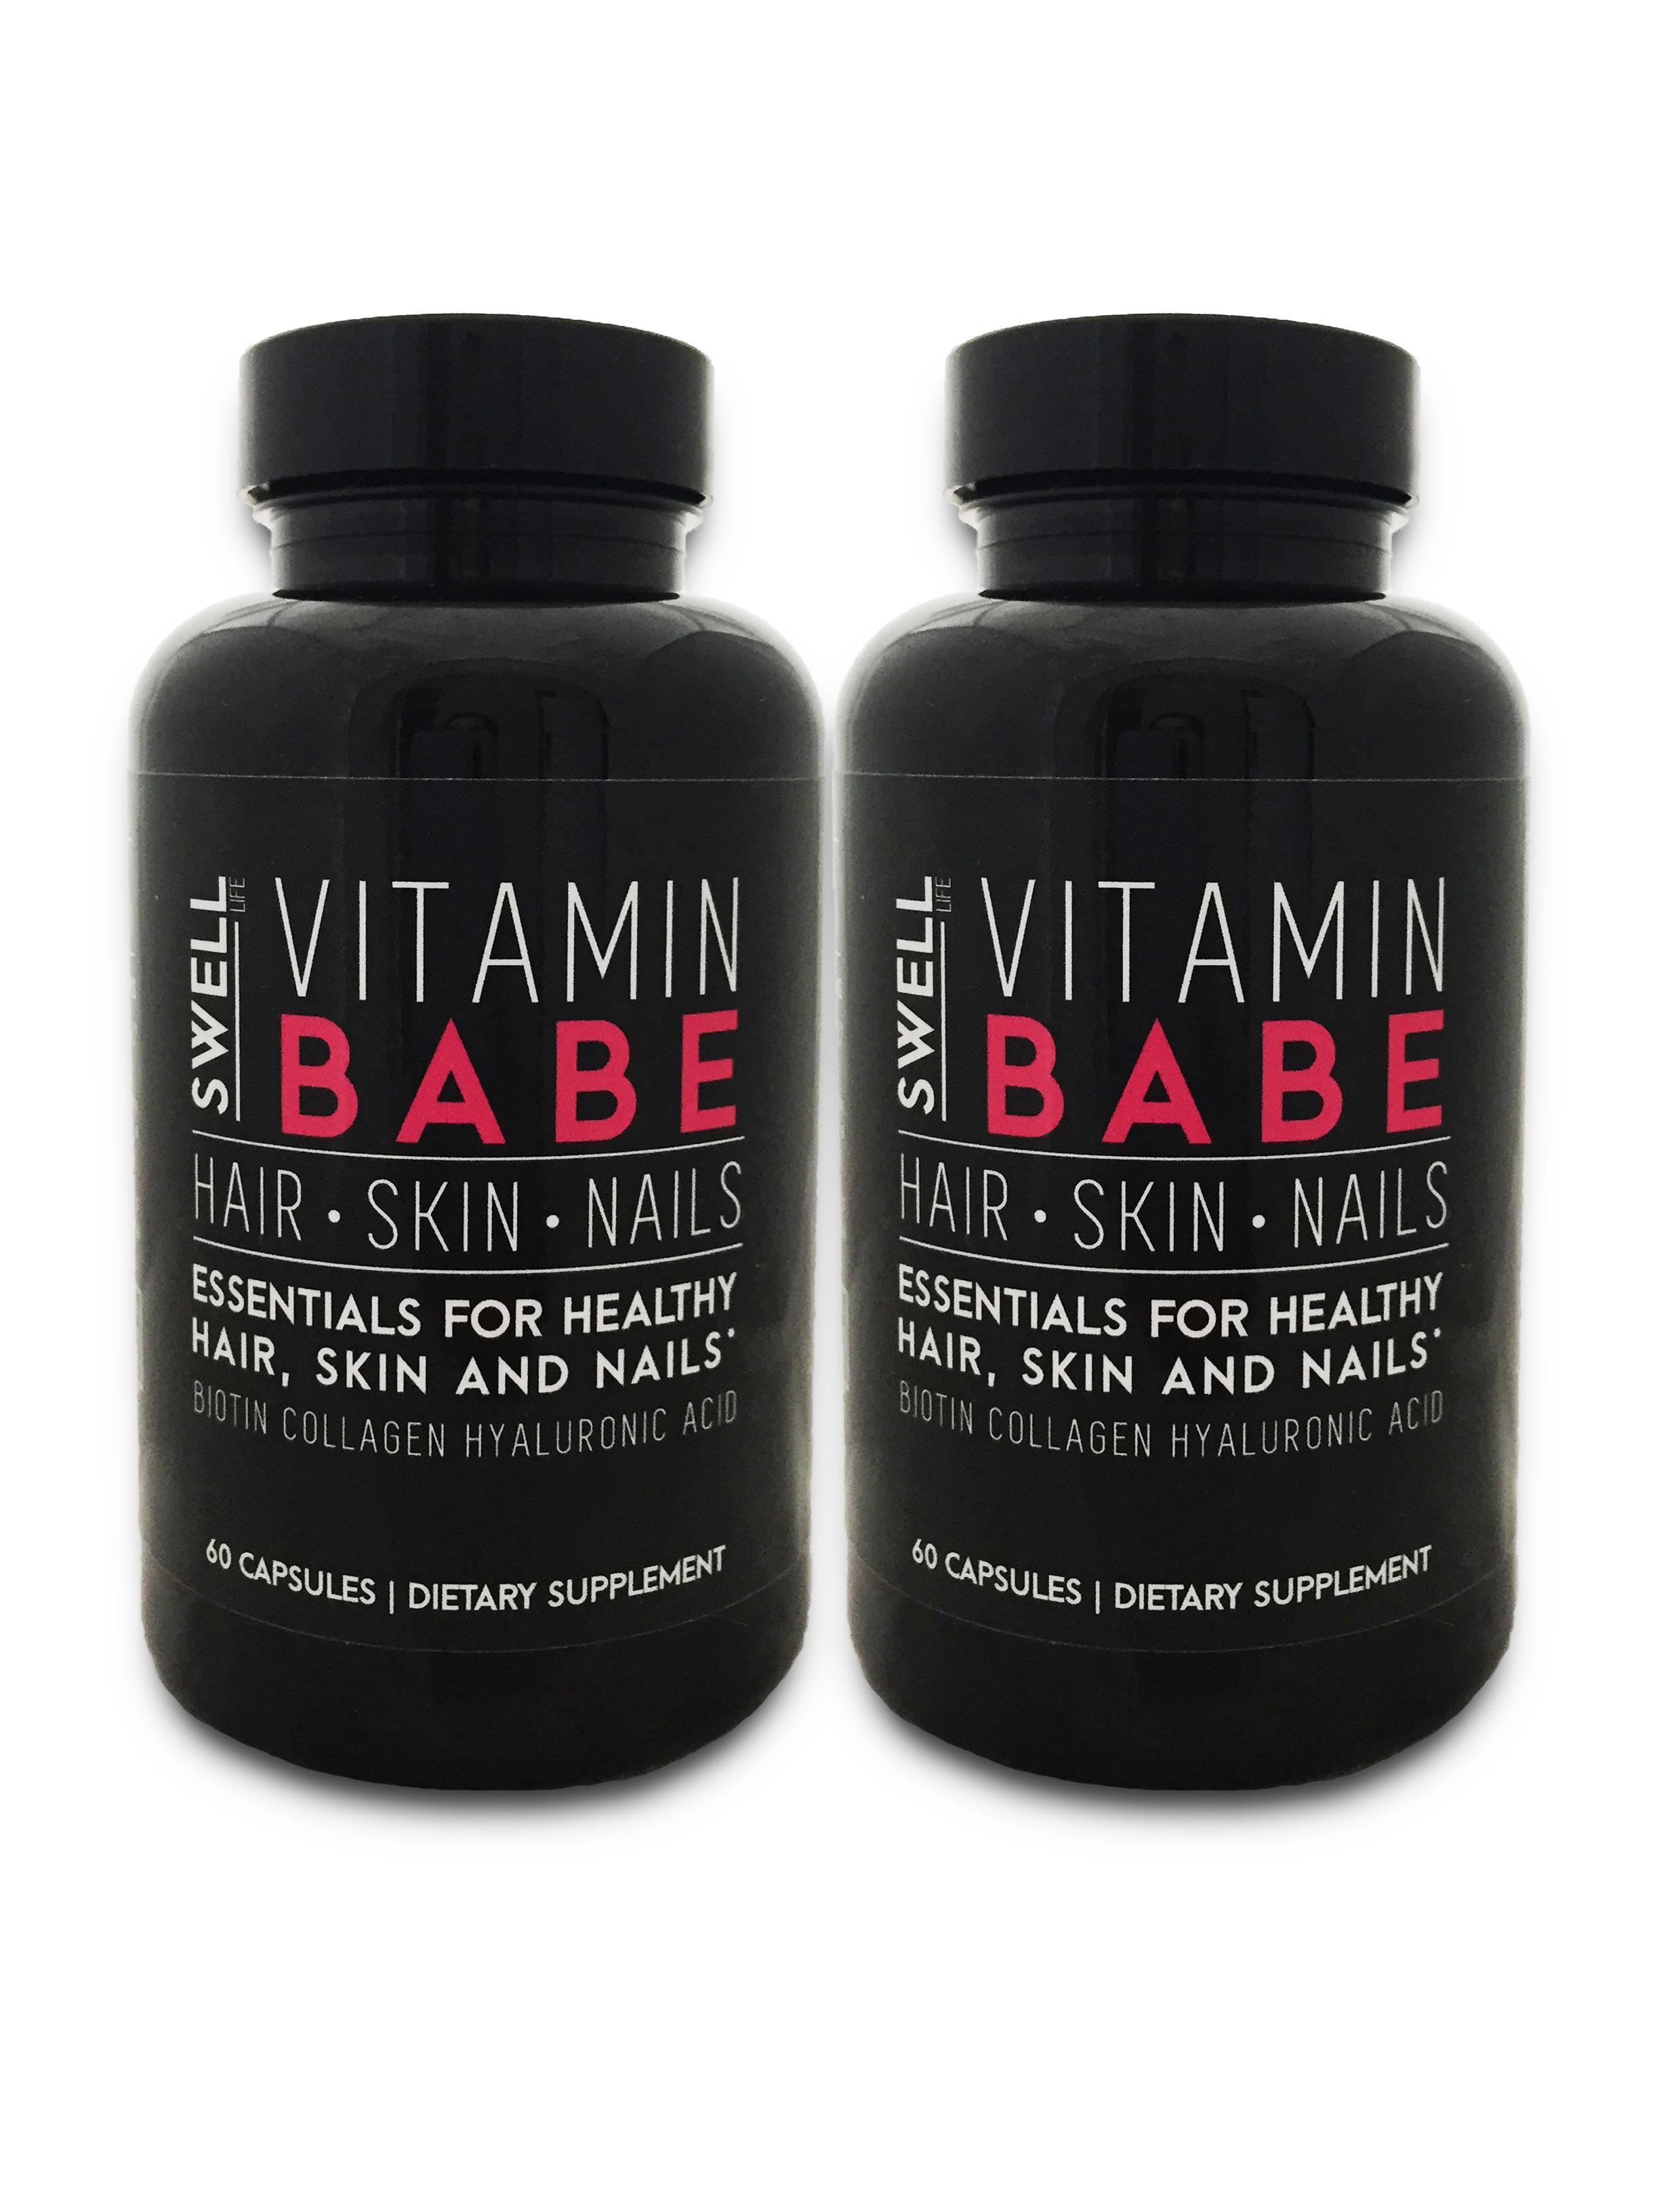 Vitamin Babe Hair Skin & Nails - 4 month supply | Swell Life